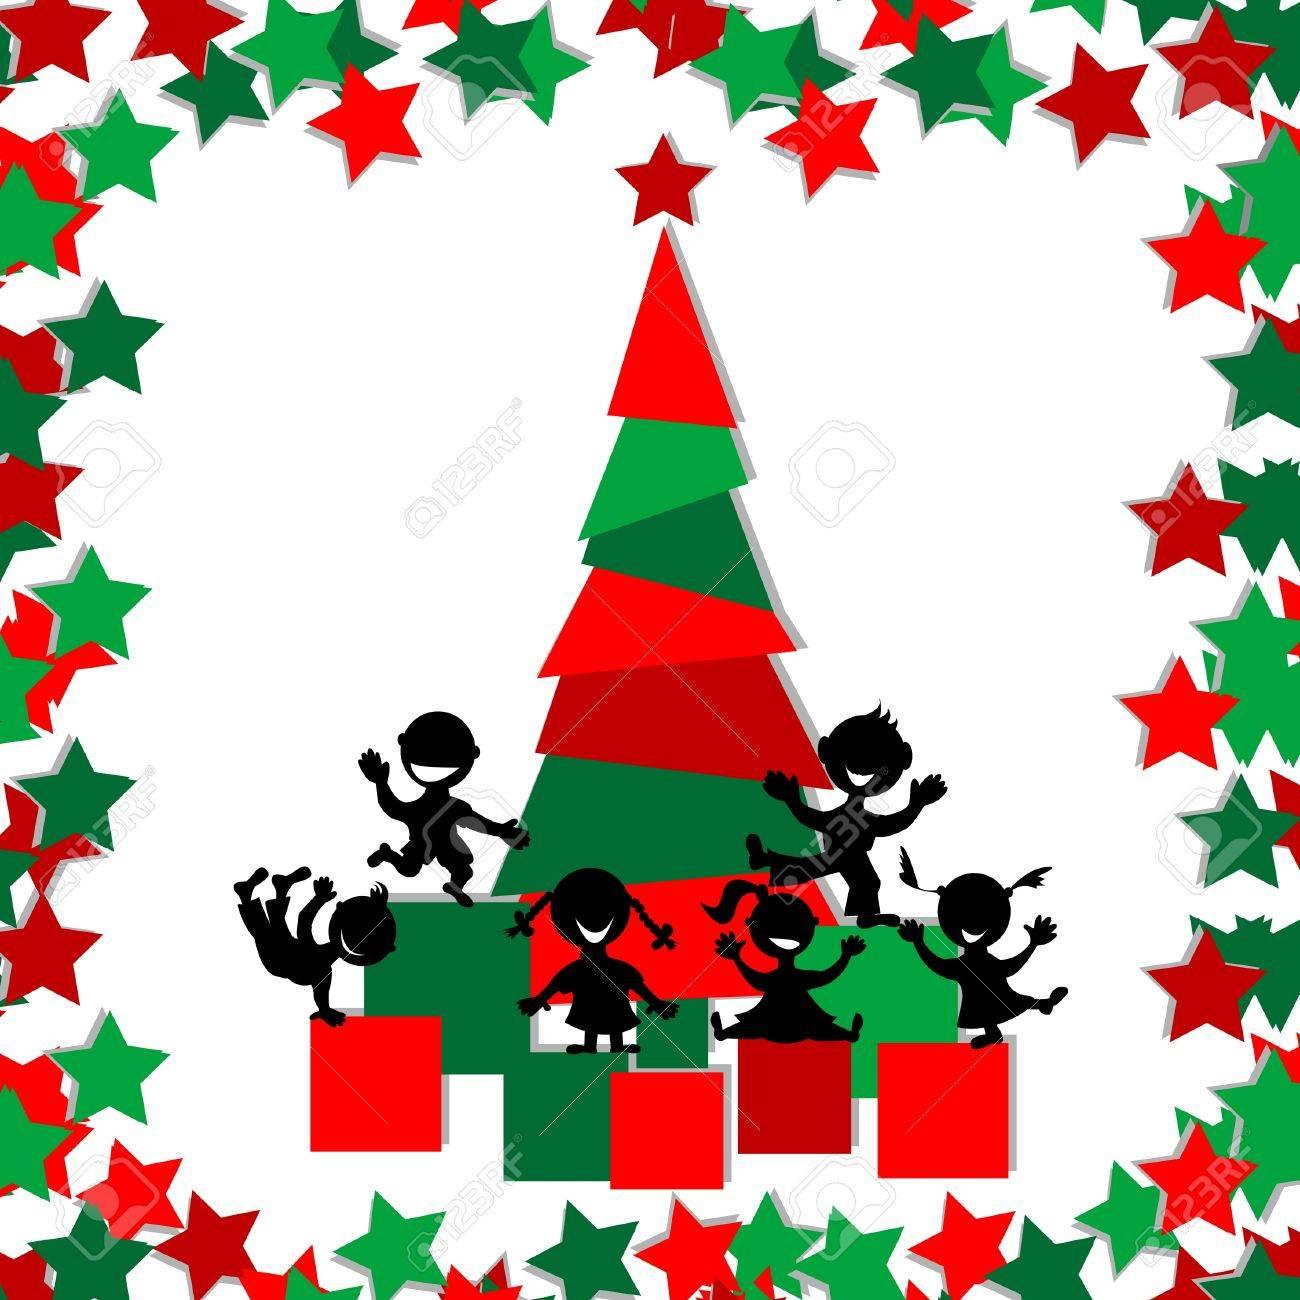 Christmas Card With Kids Playing Around A Christmas Tree Royalty ...